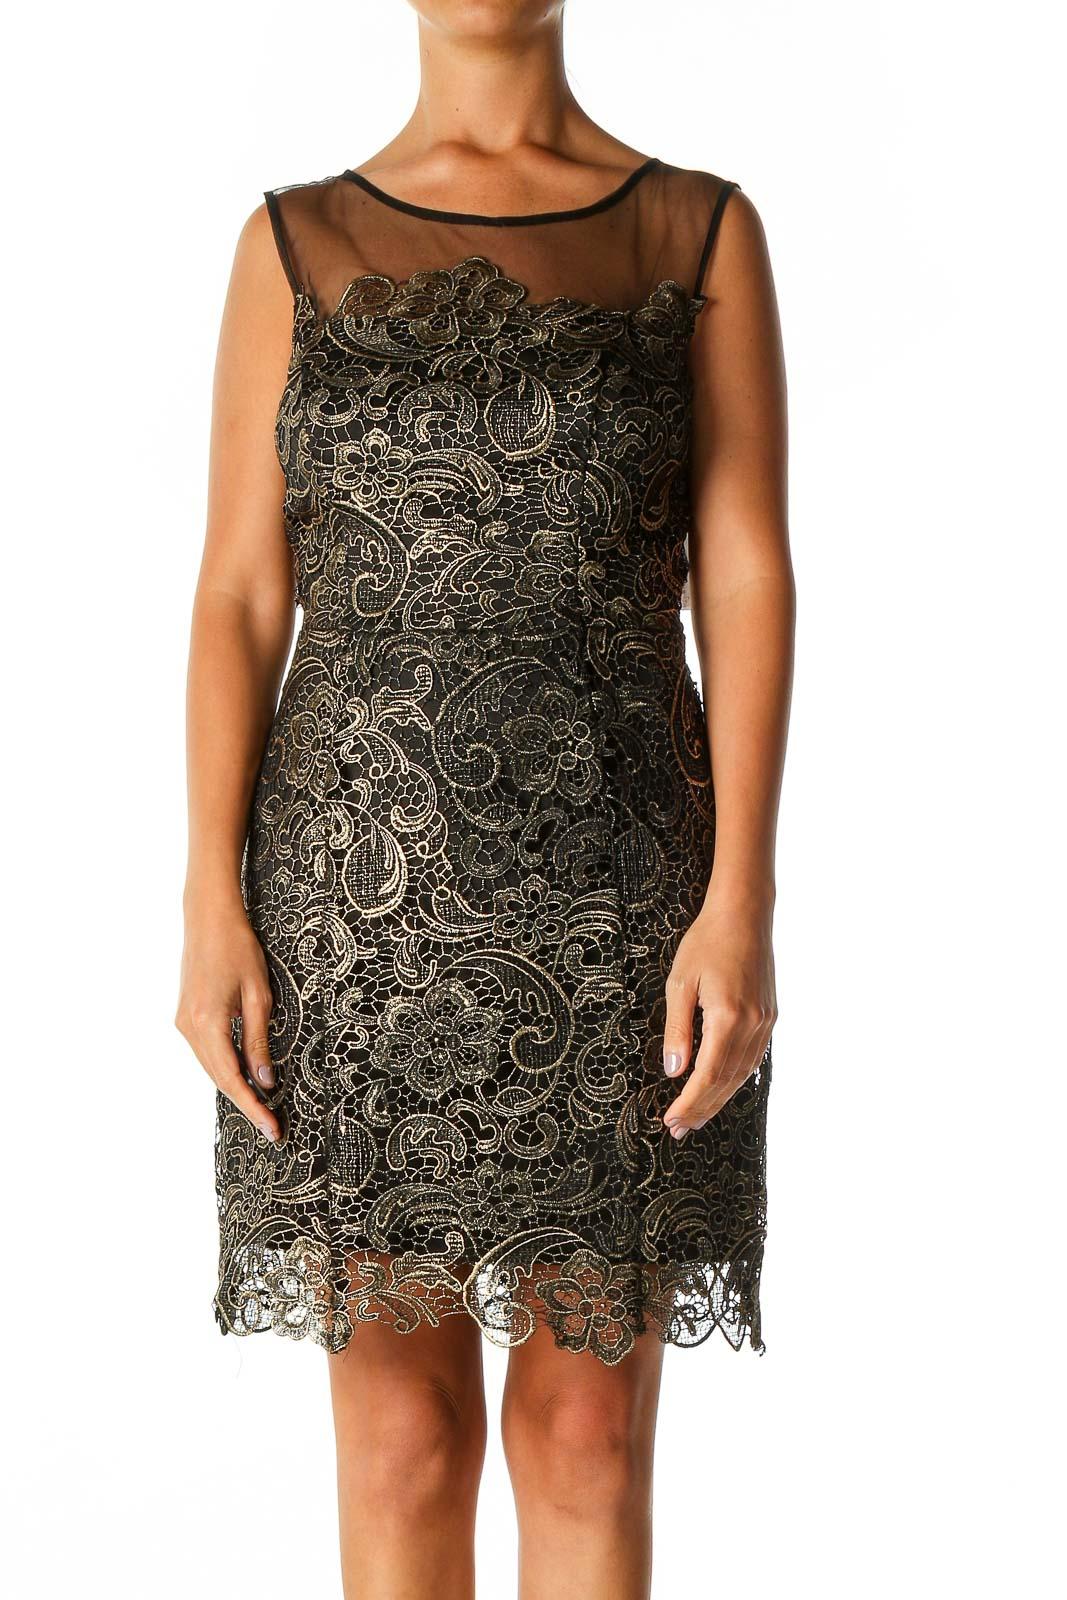 Black Lace Casual A-Line Dress Front